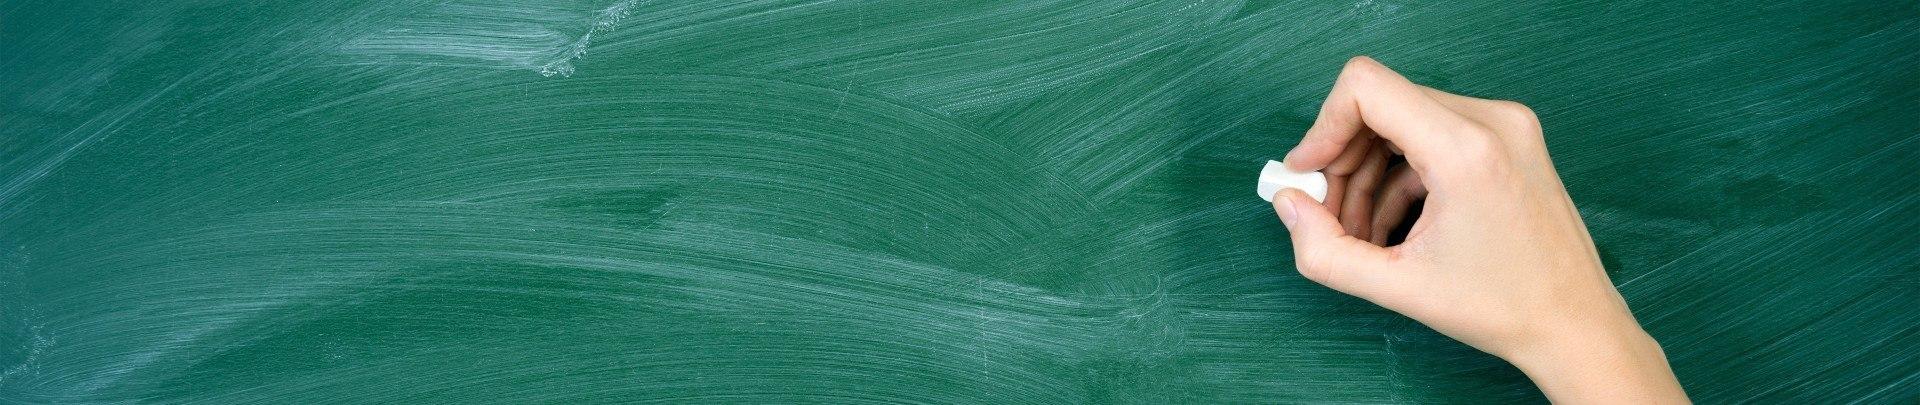 Foto: Grüne Tafel